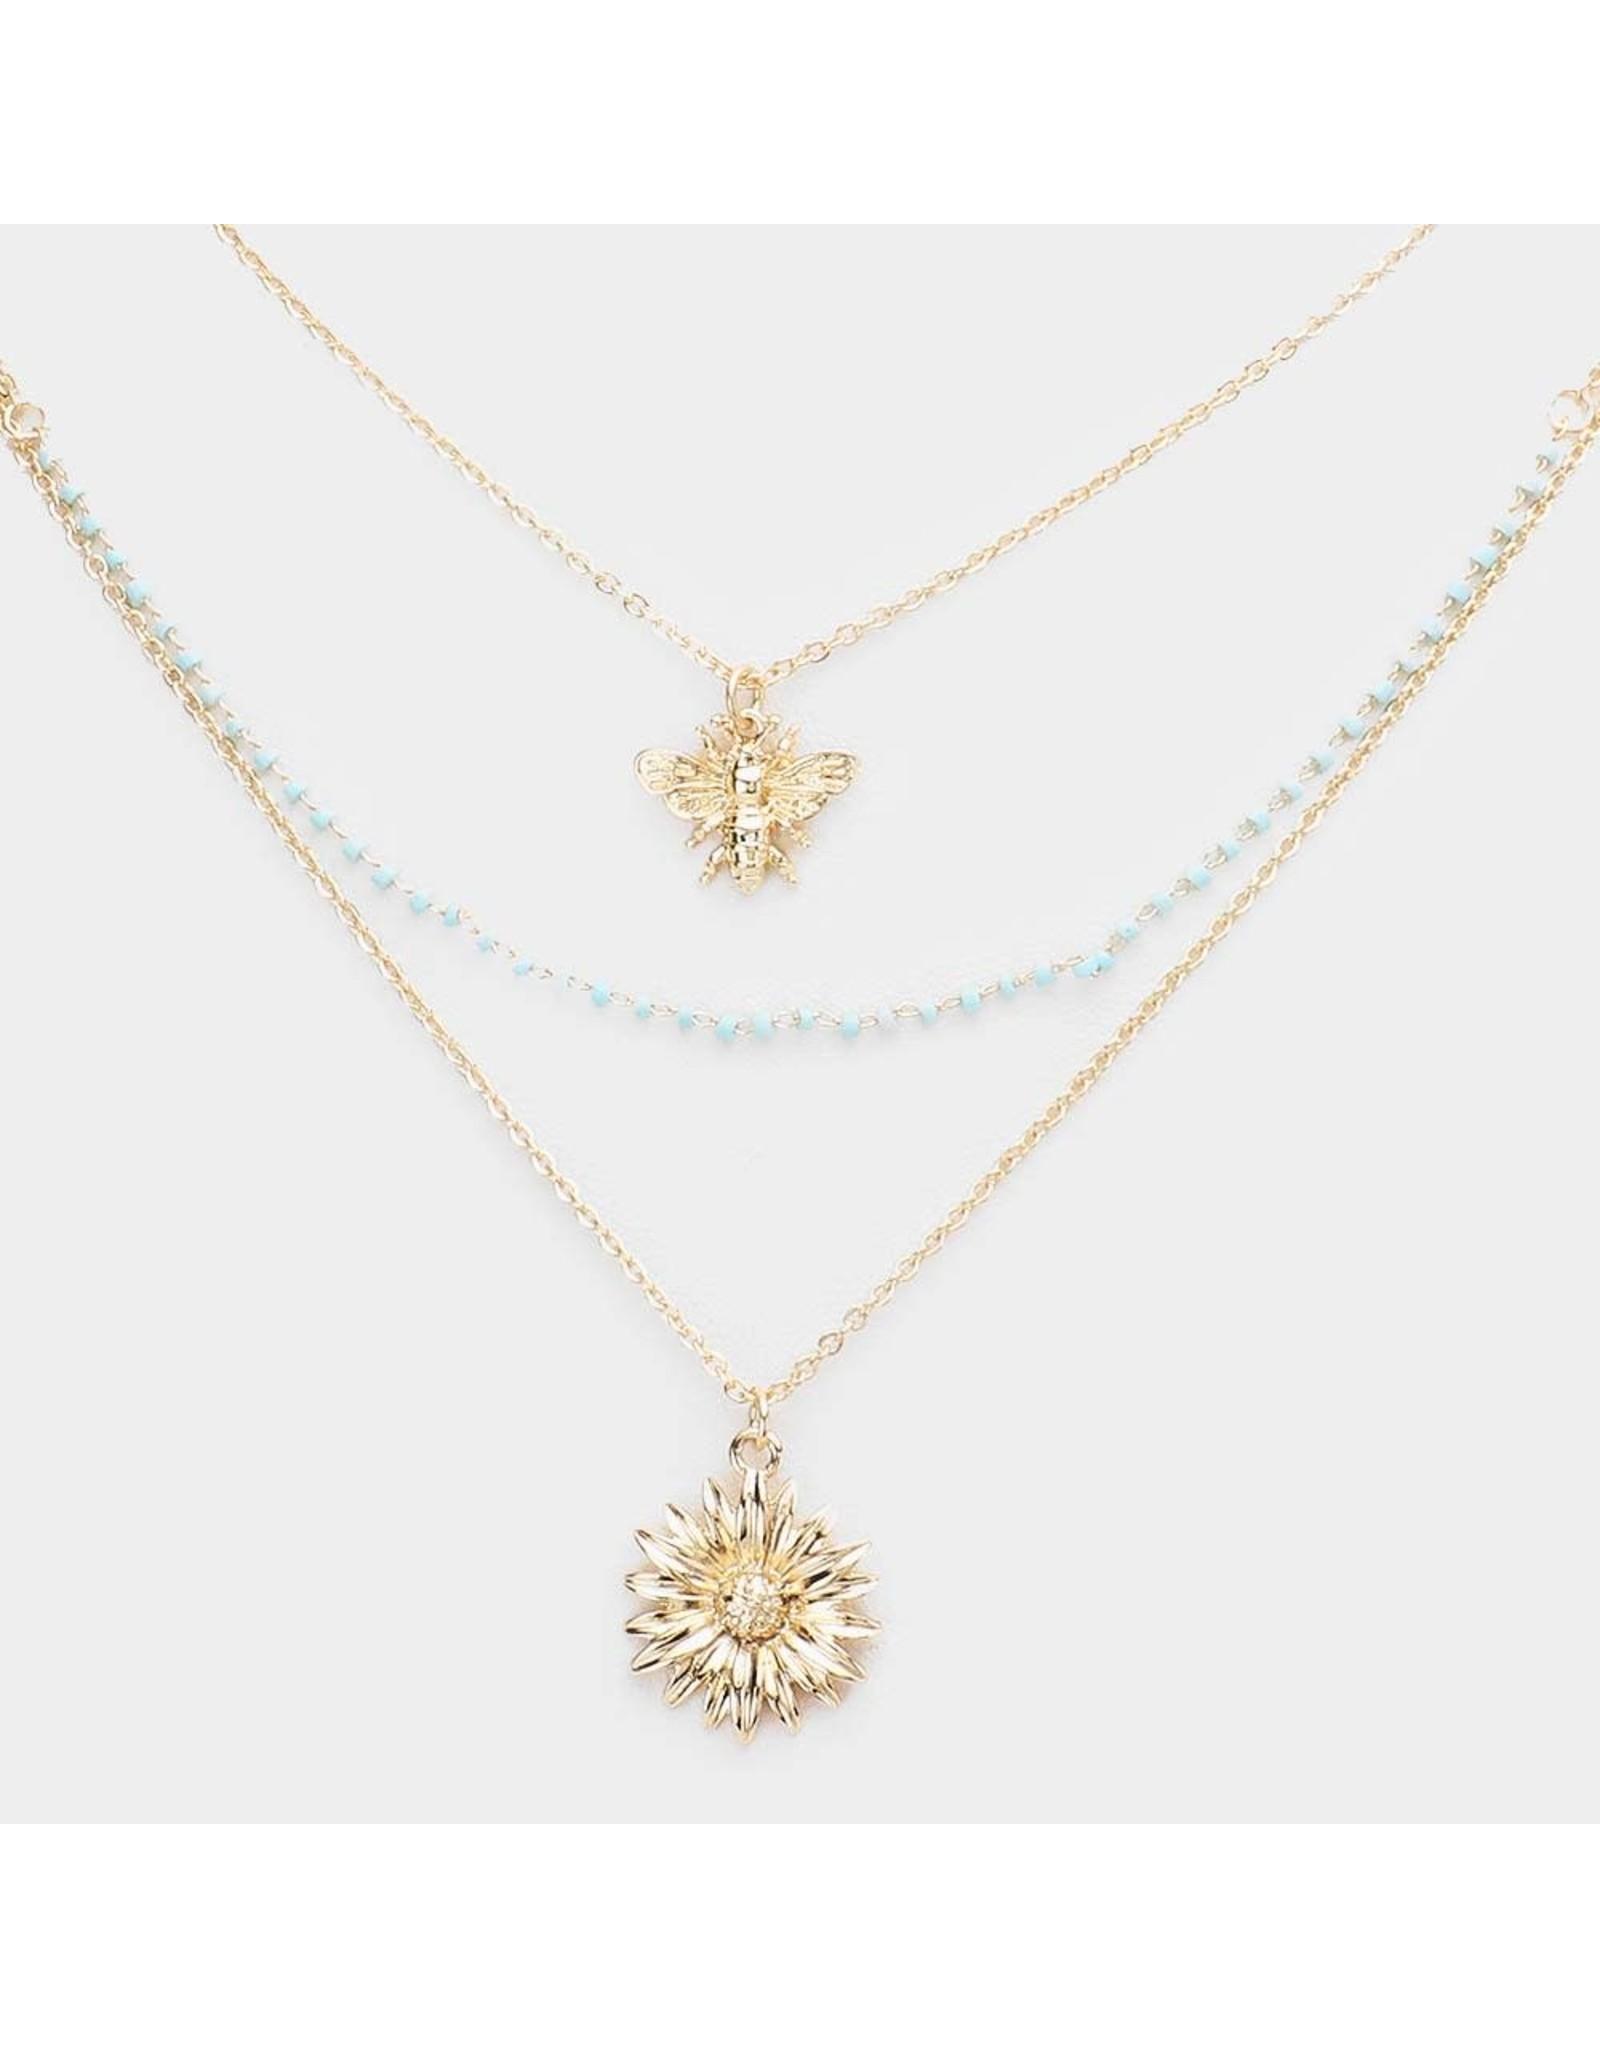 Triple Layered Honeybee Flower Necklace